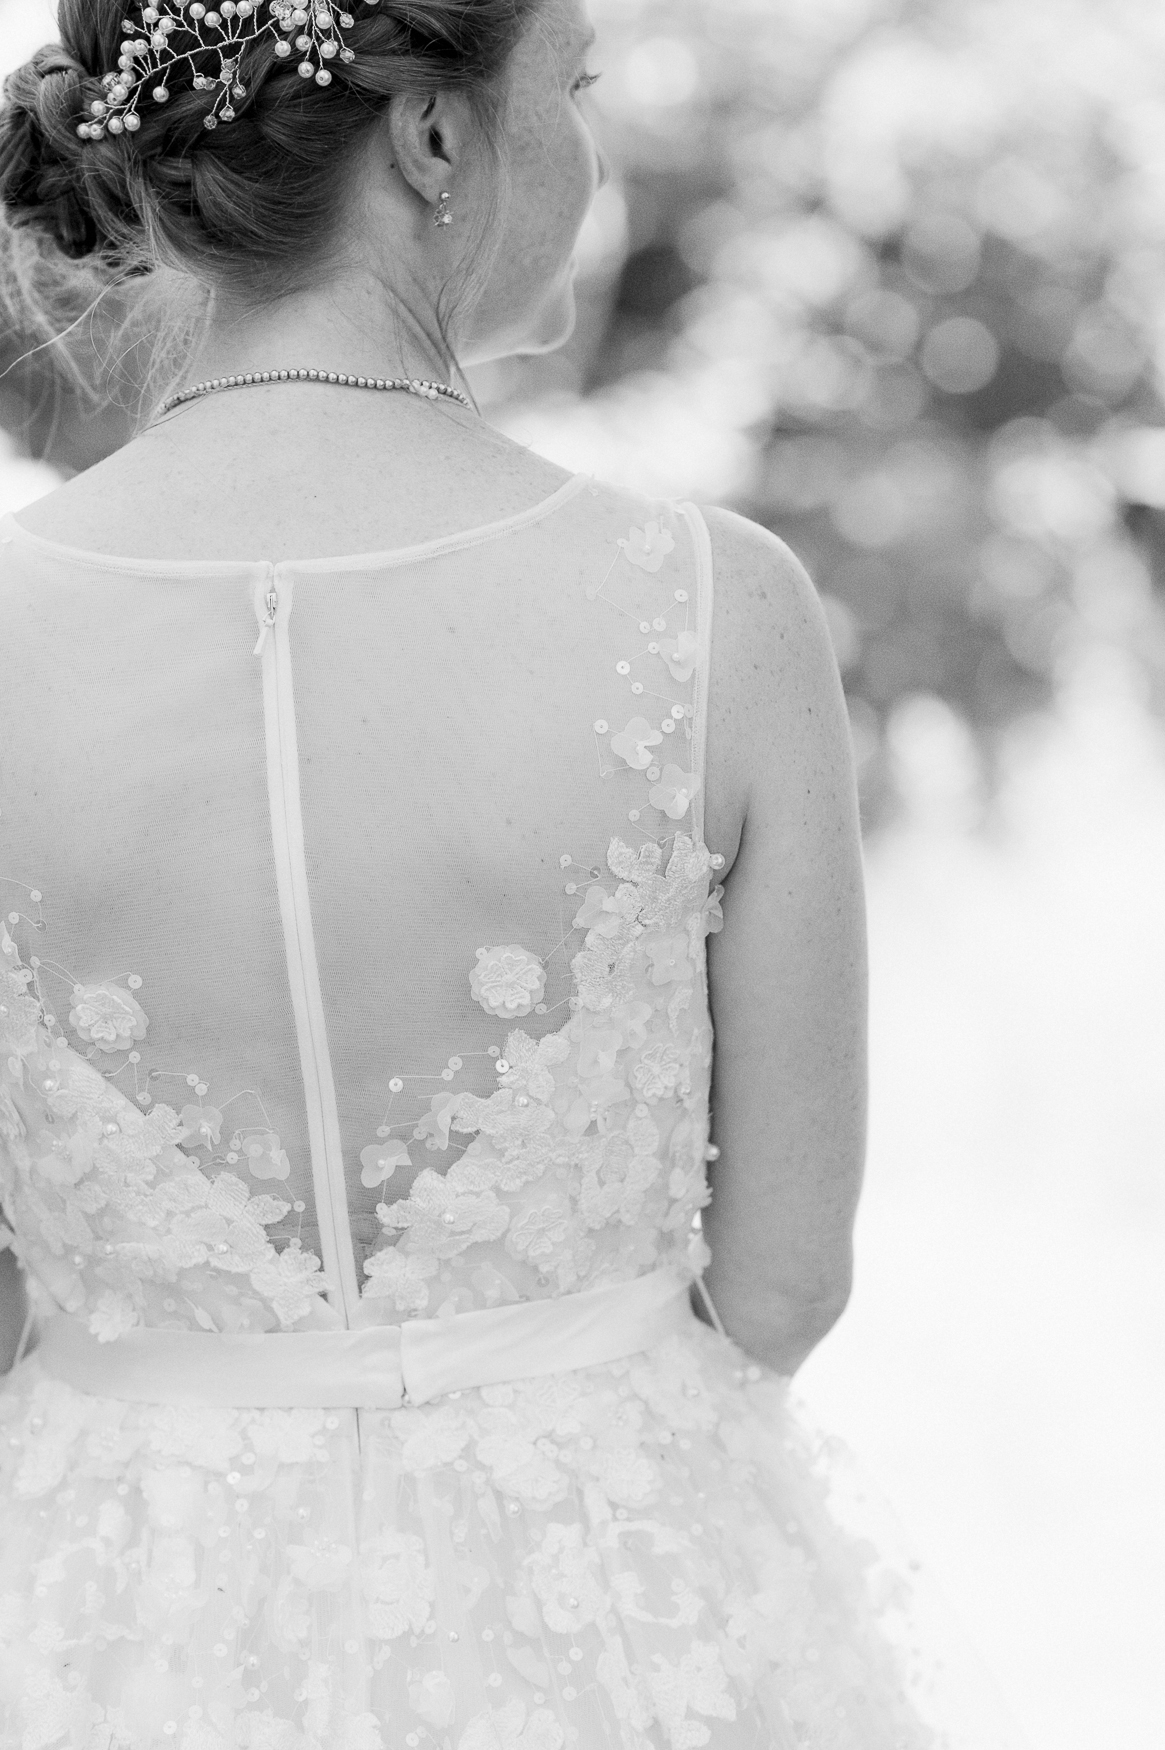 virginiawedding_theGlasgowFarm_rusticwedding_fredericksburg_youseephotography_CarolineDale (62).jpg